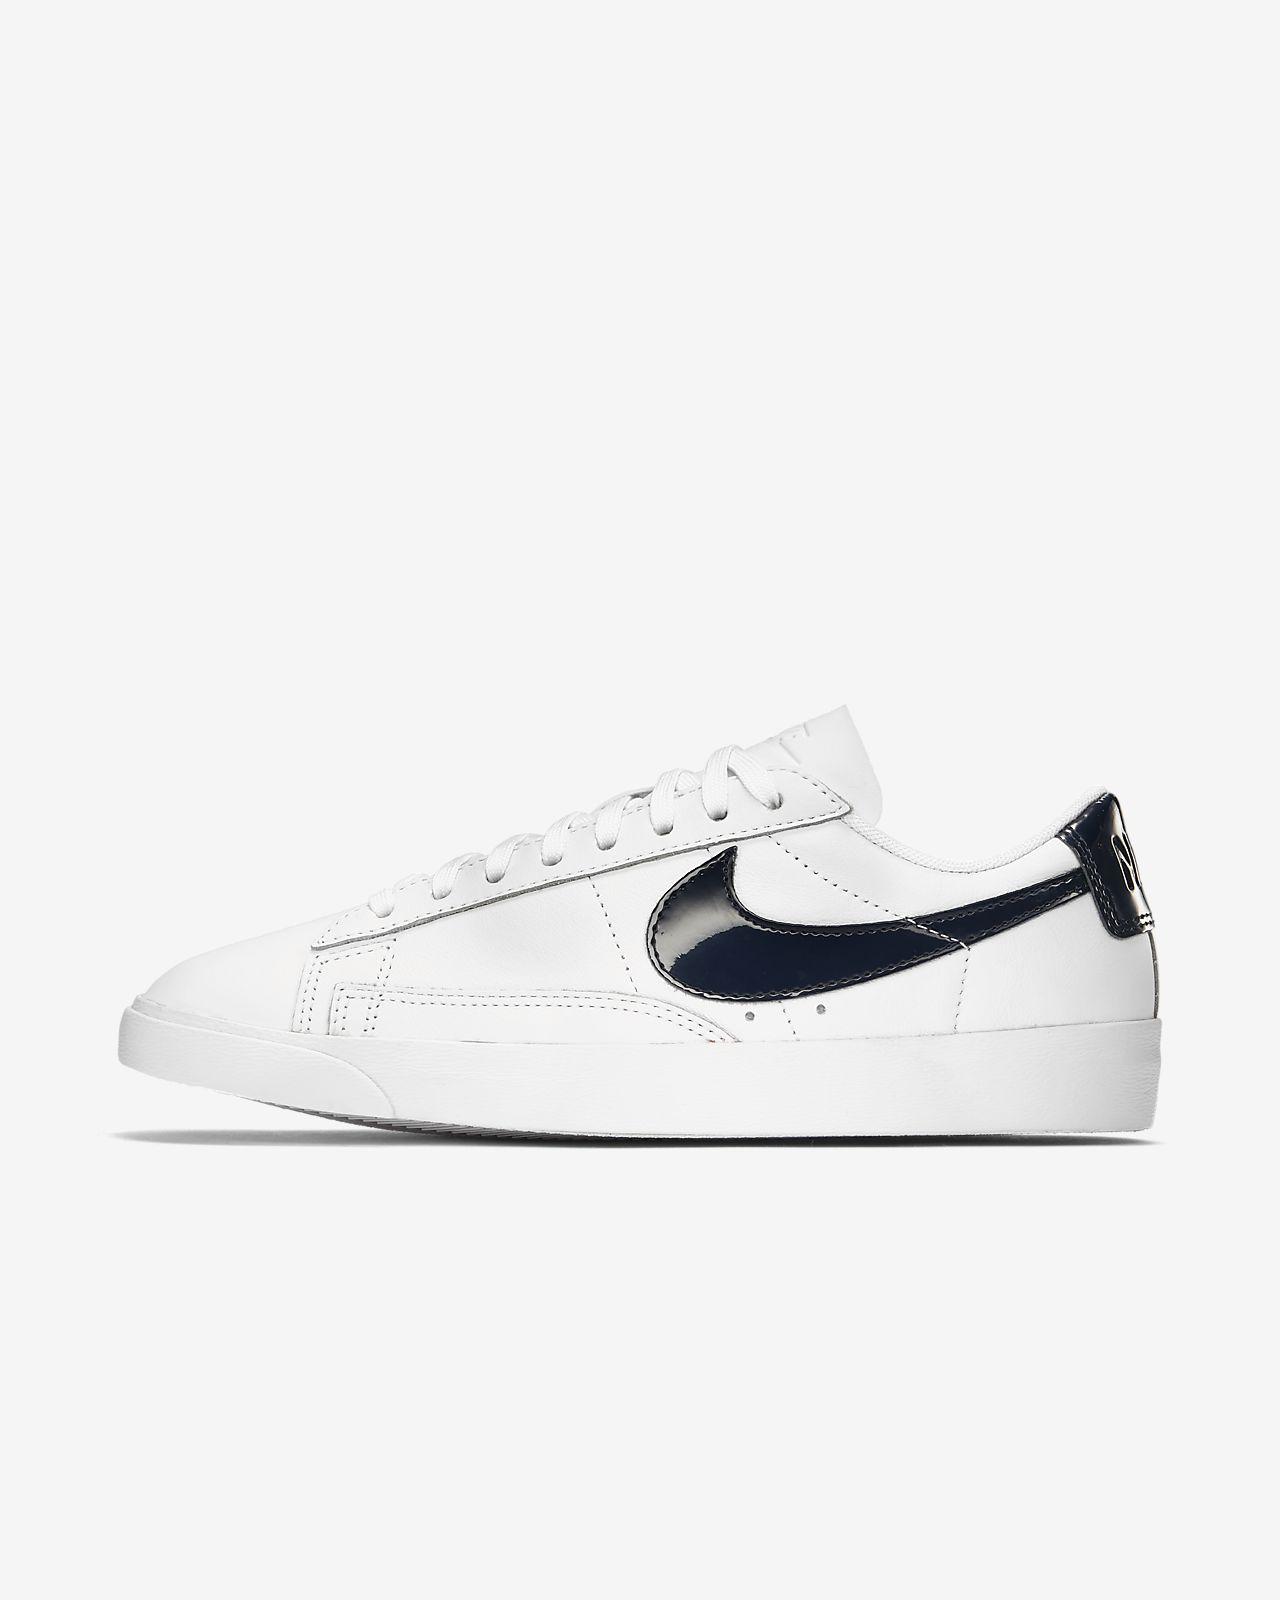 Nike Chaussures Blazer Low Se Premium W Nike uJTRov6c7